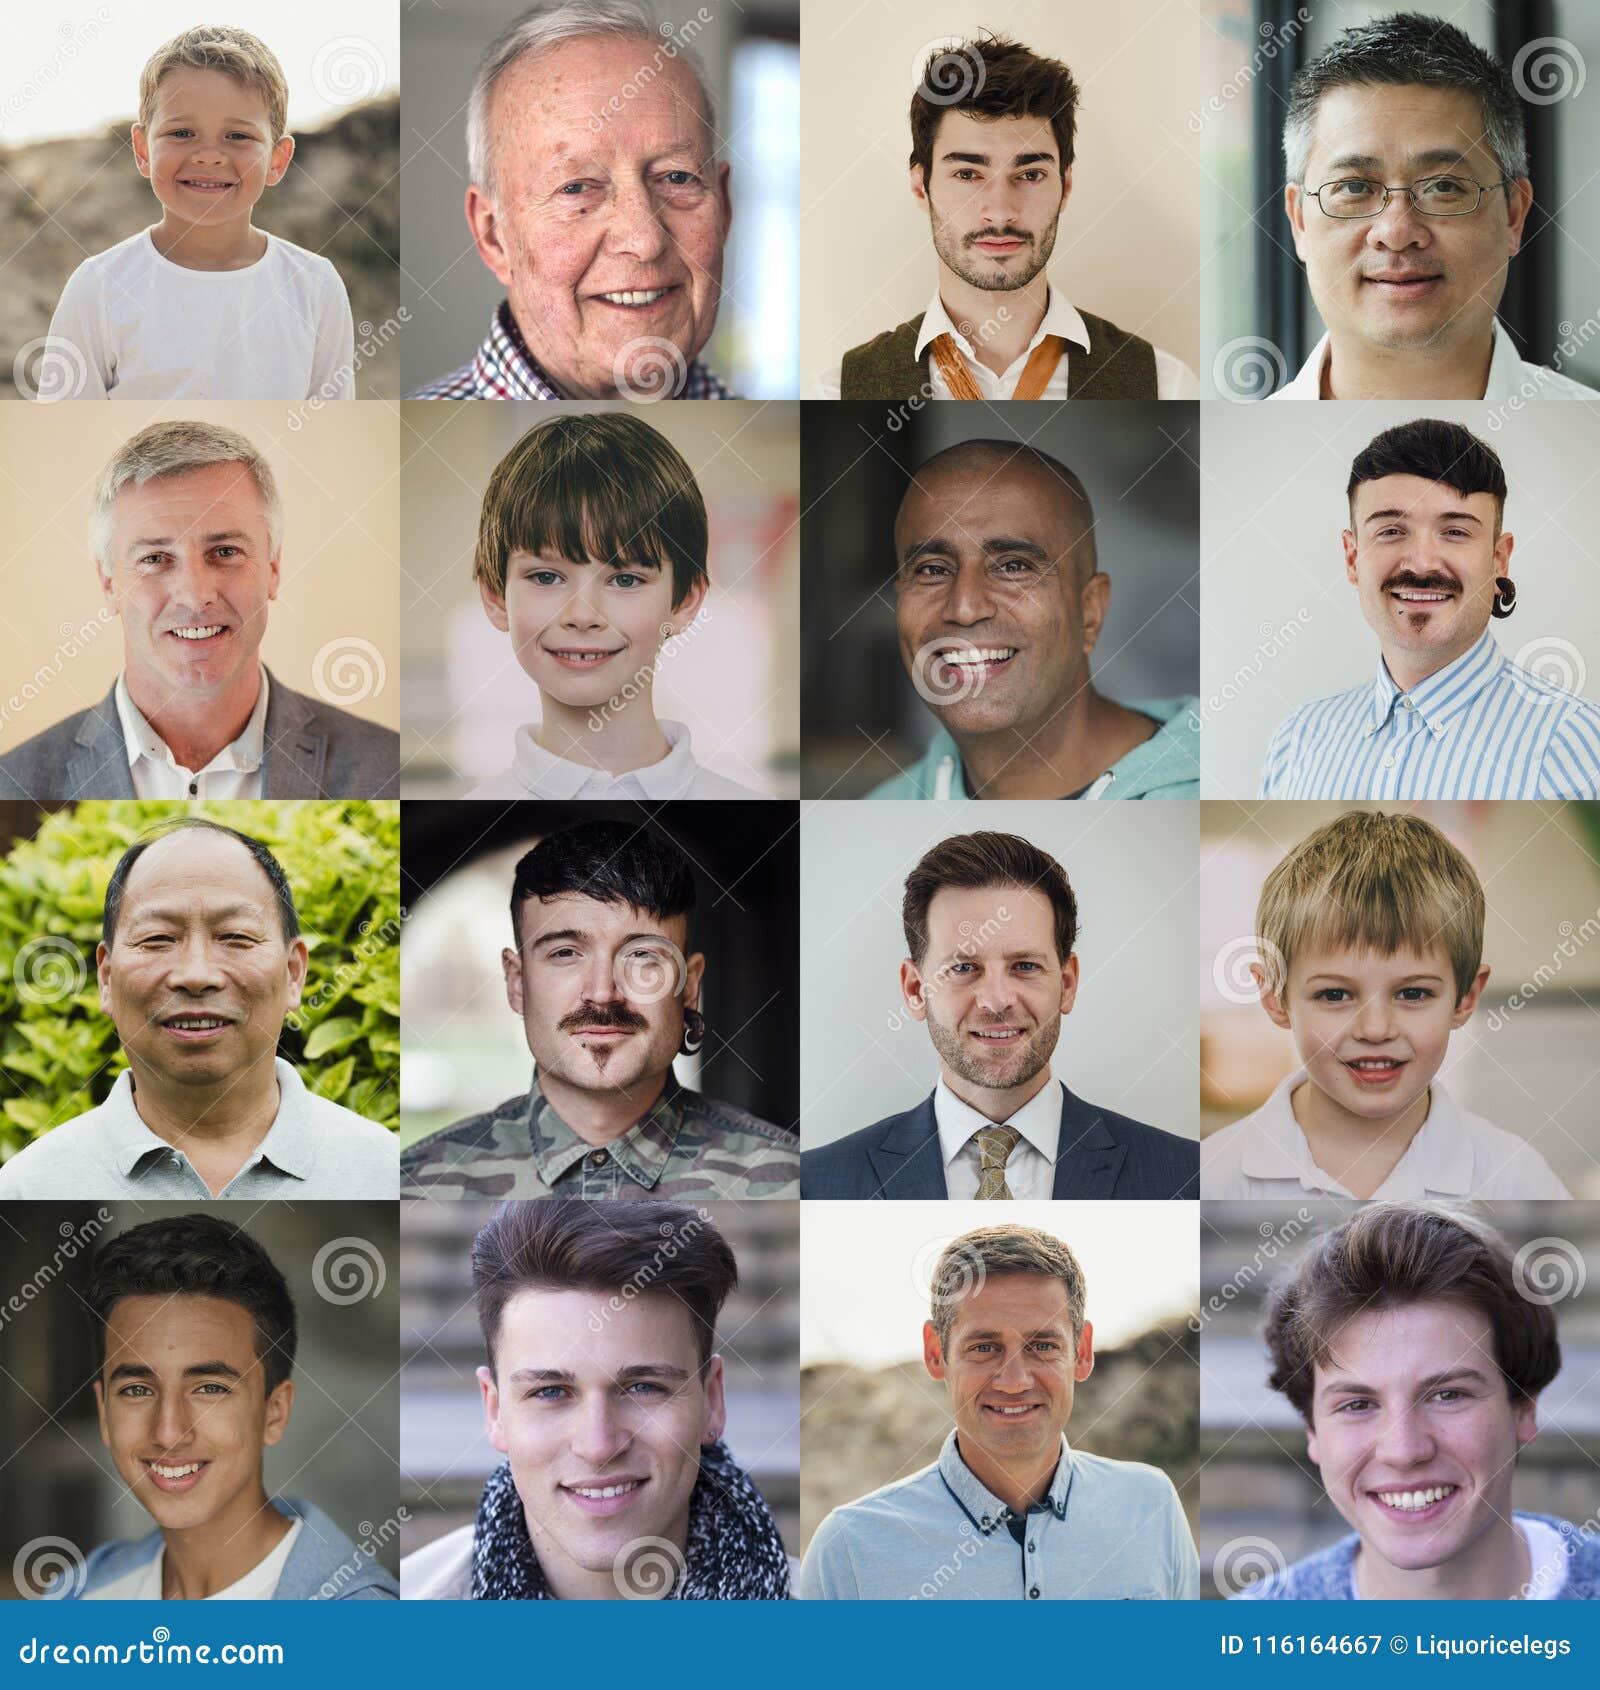 Male Headshot Collage